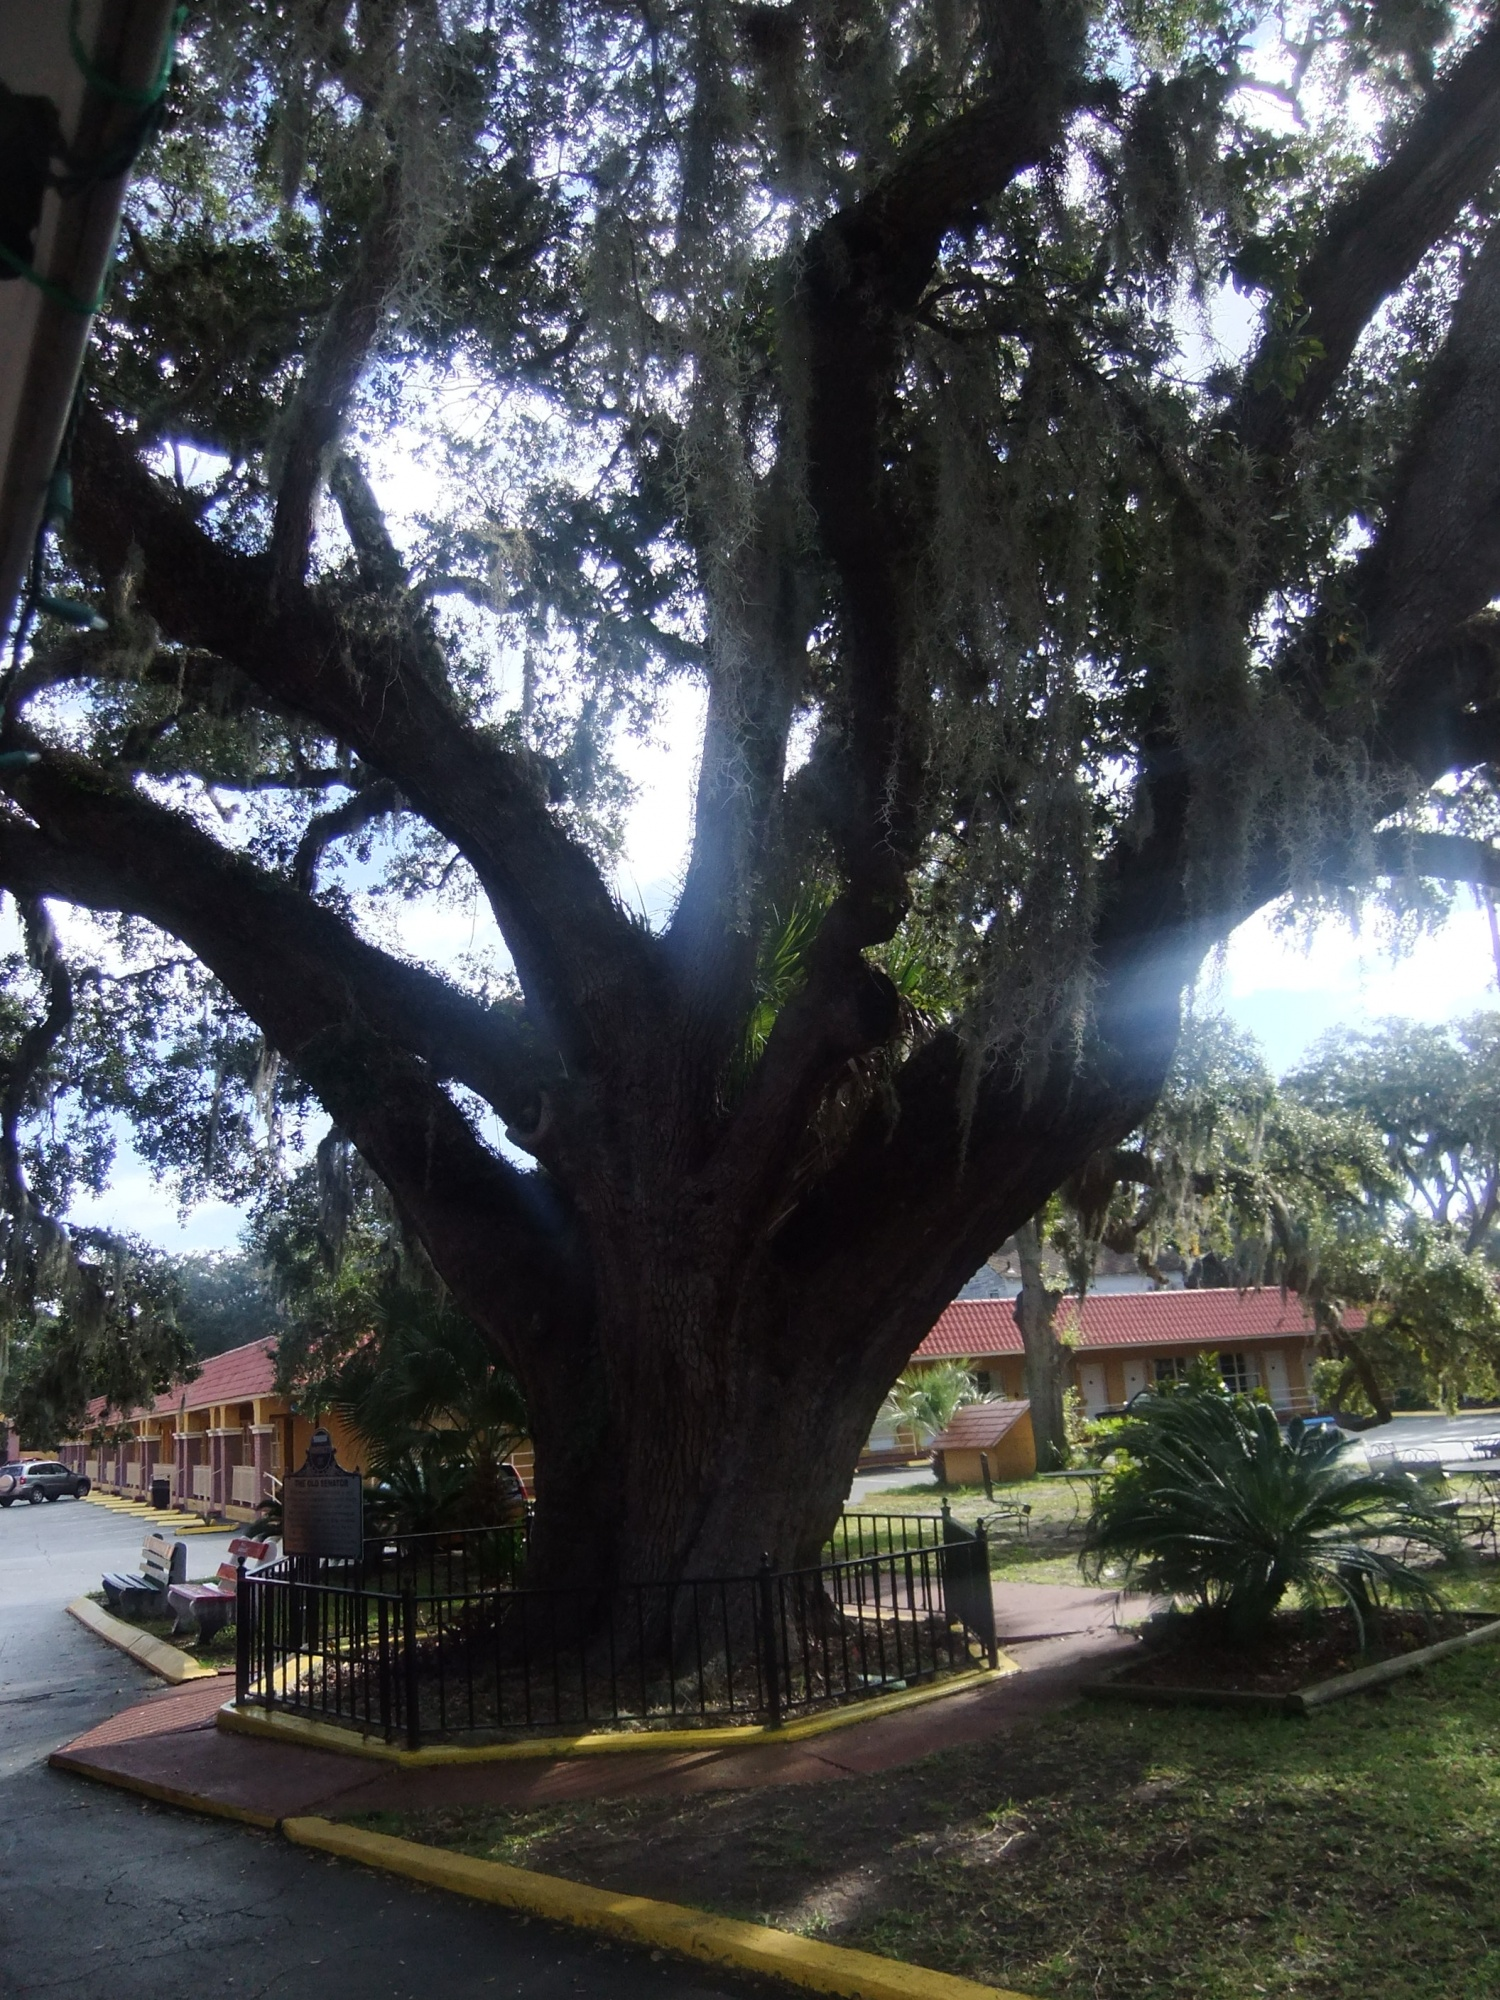 SAN AUGUSTINE FLORIDE 2011